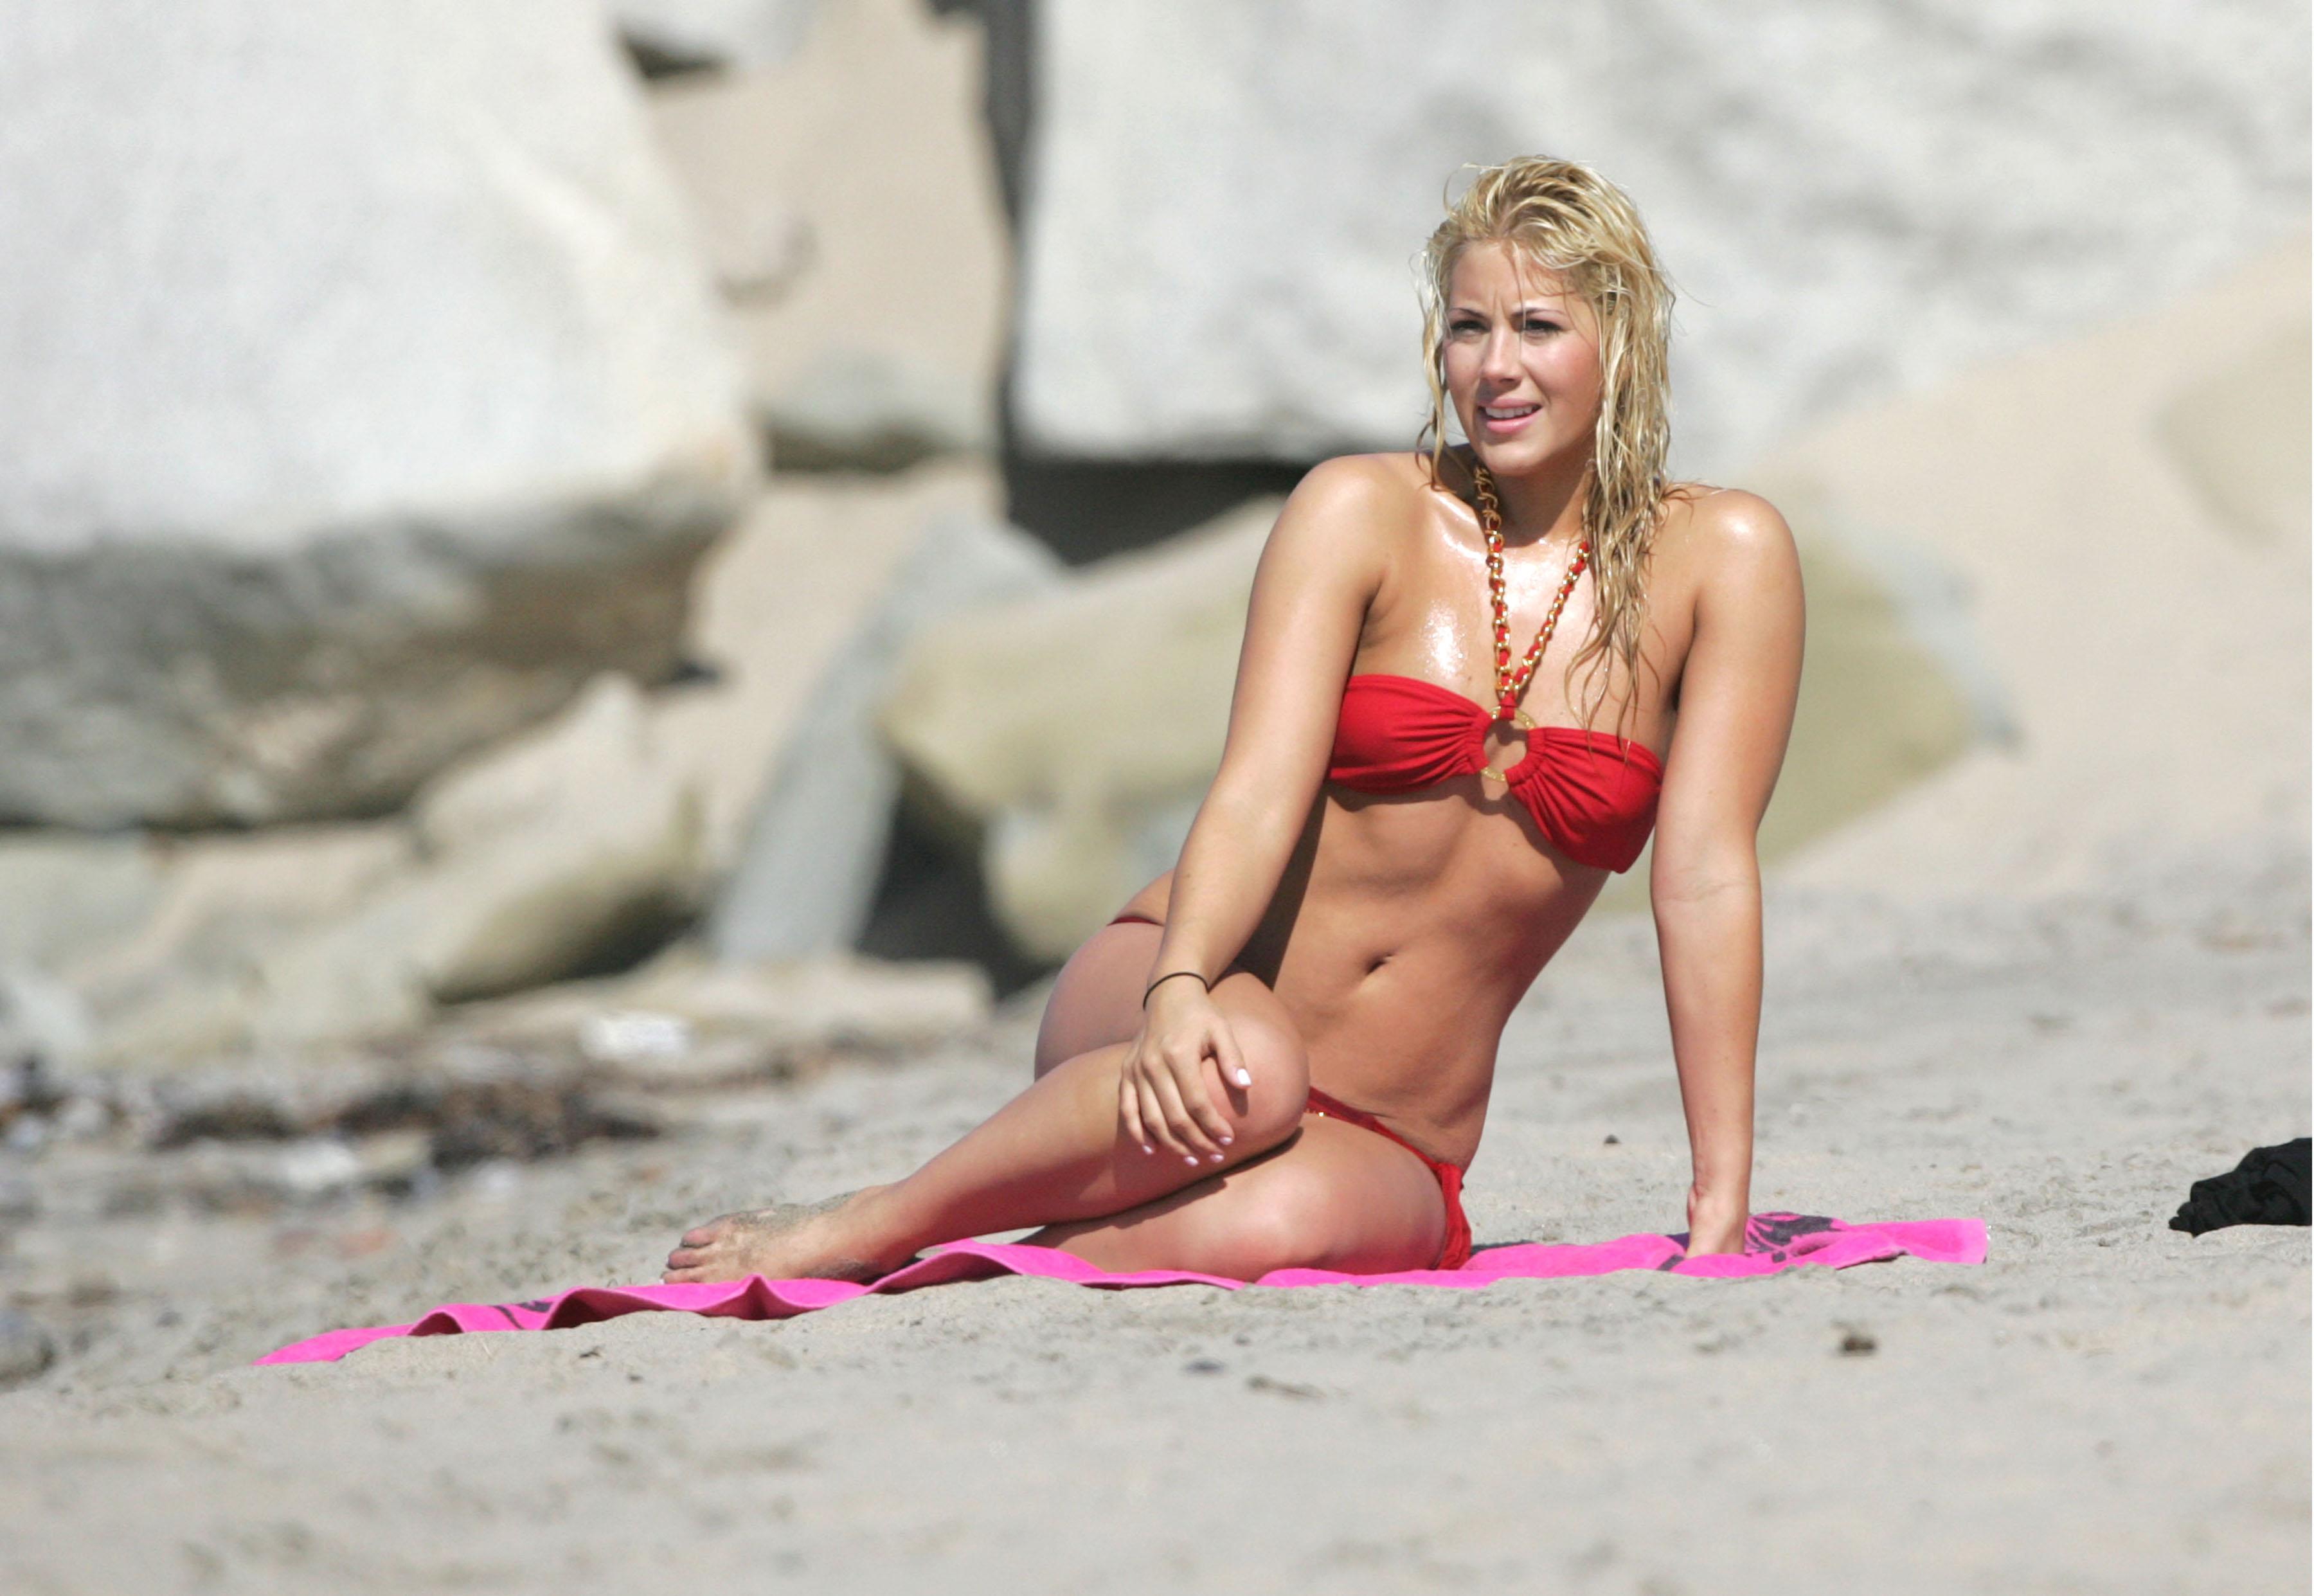 shayne lamas bikini butts celebs and amateurs